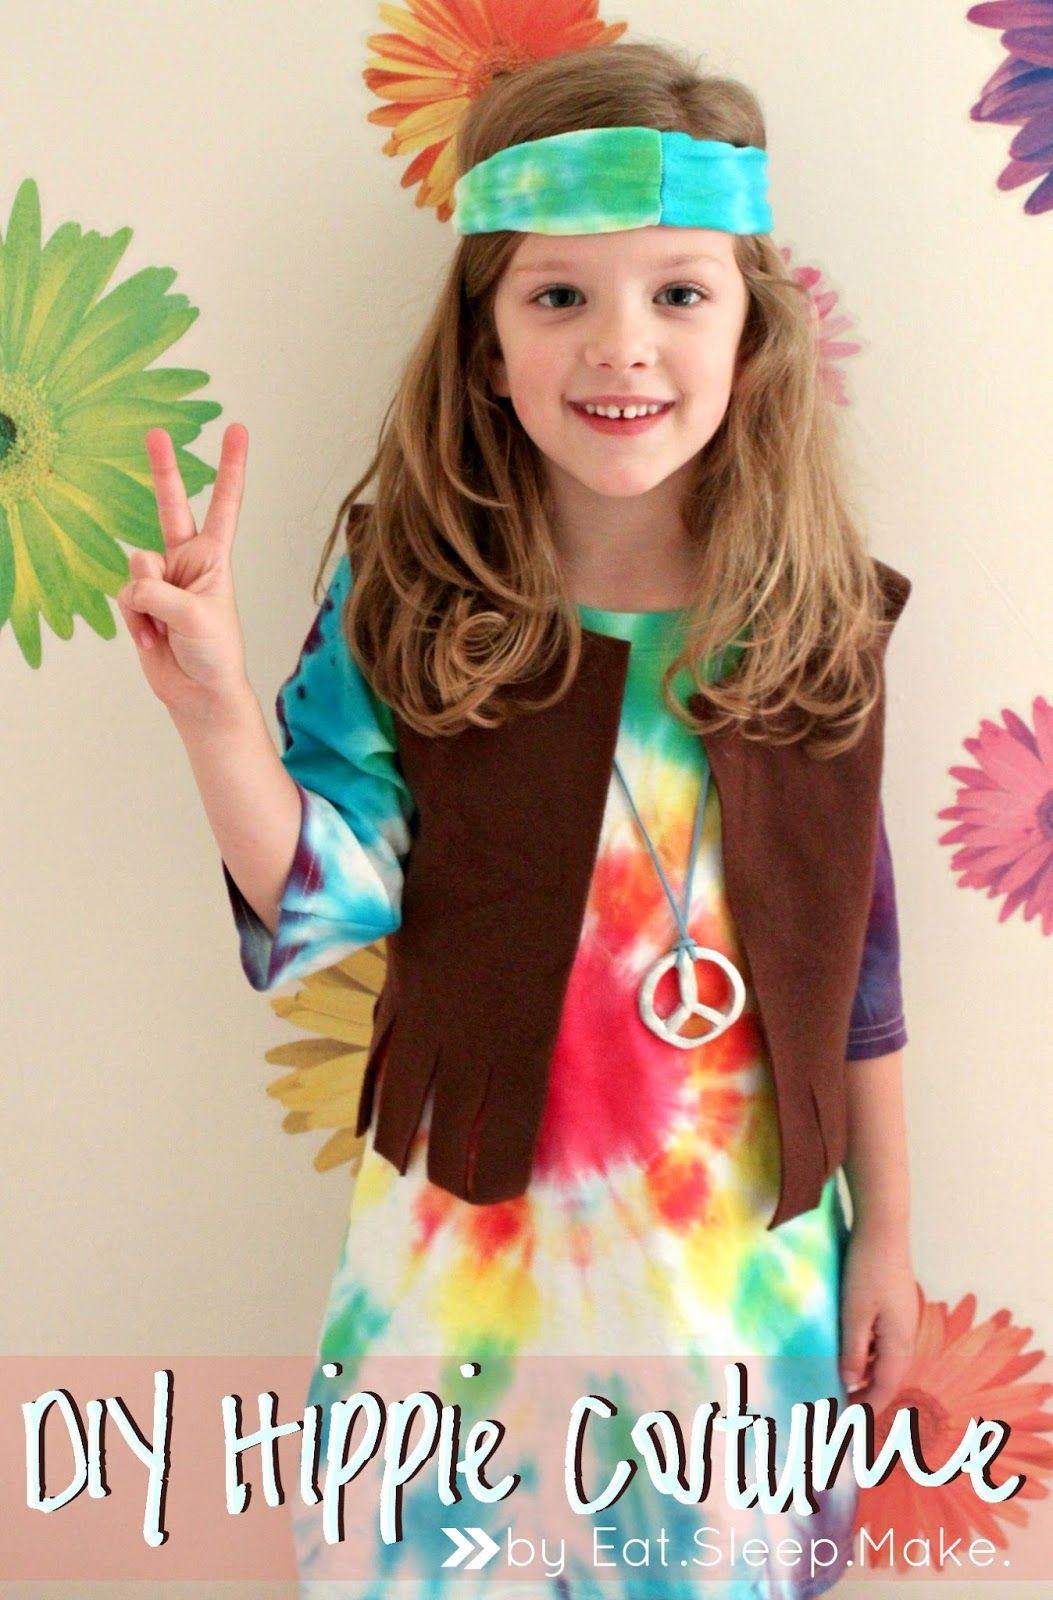 Groovy Girl Costume Kids 60s 70s Outfit Halloween Fancy Dress